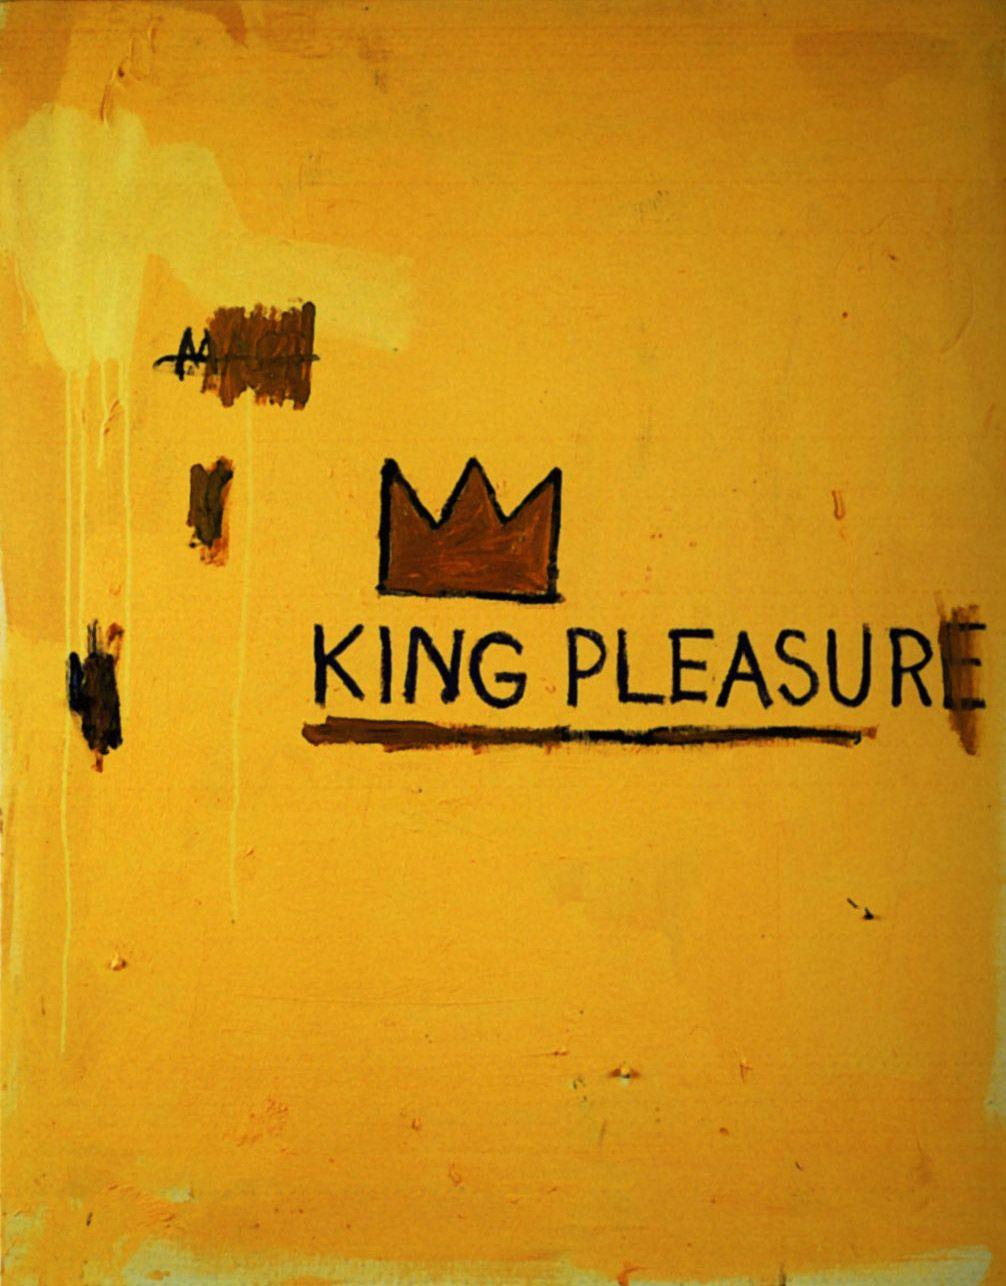 of pleasure King